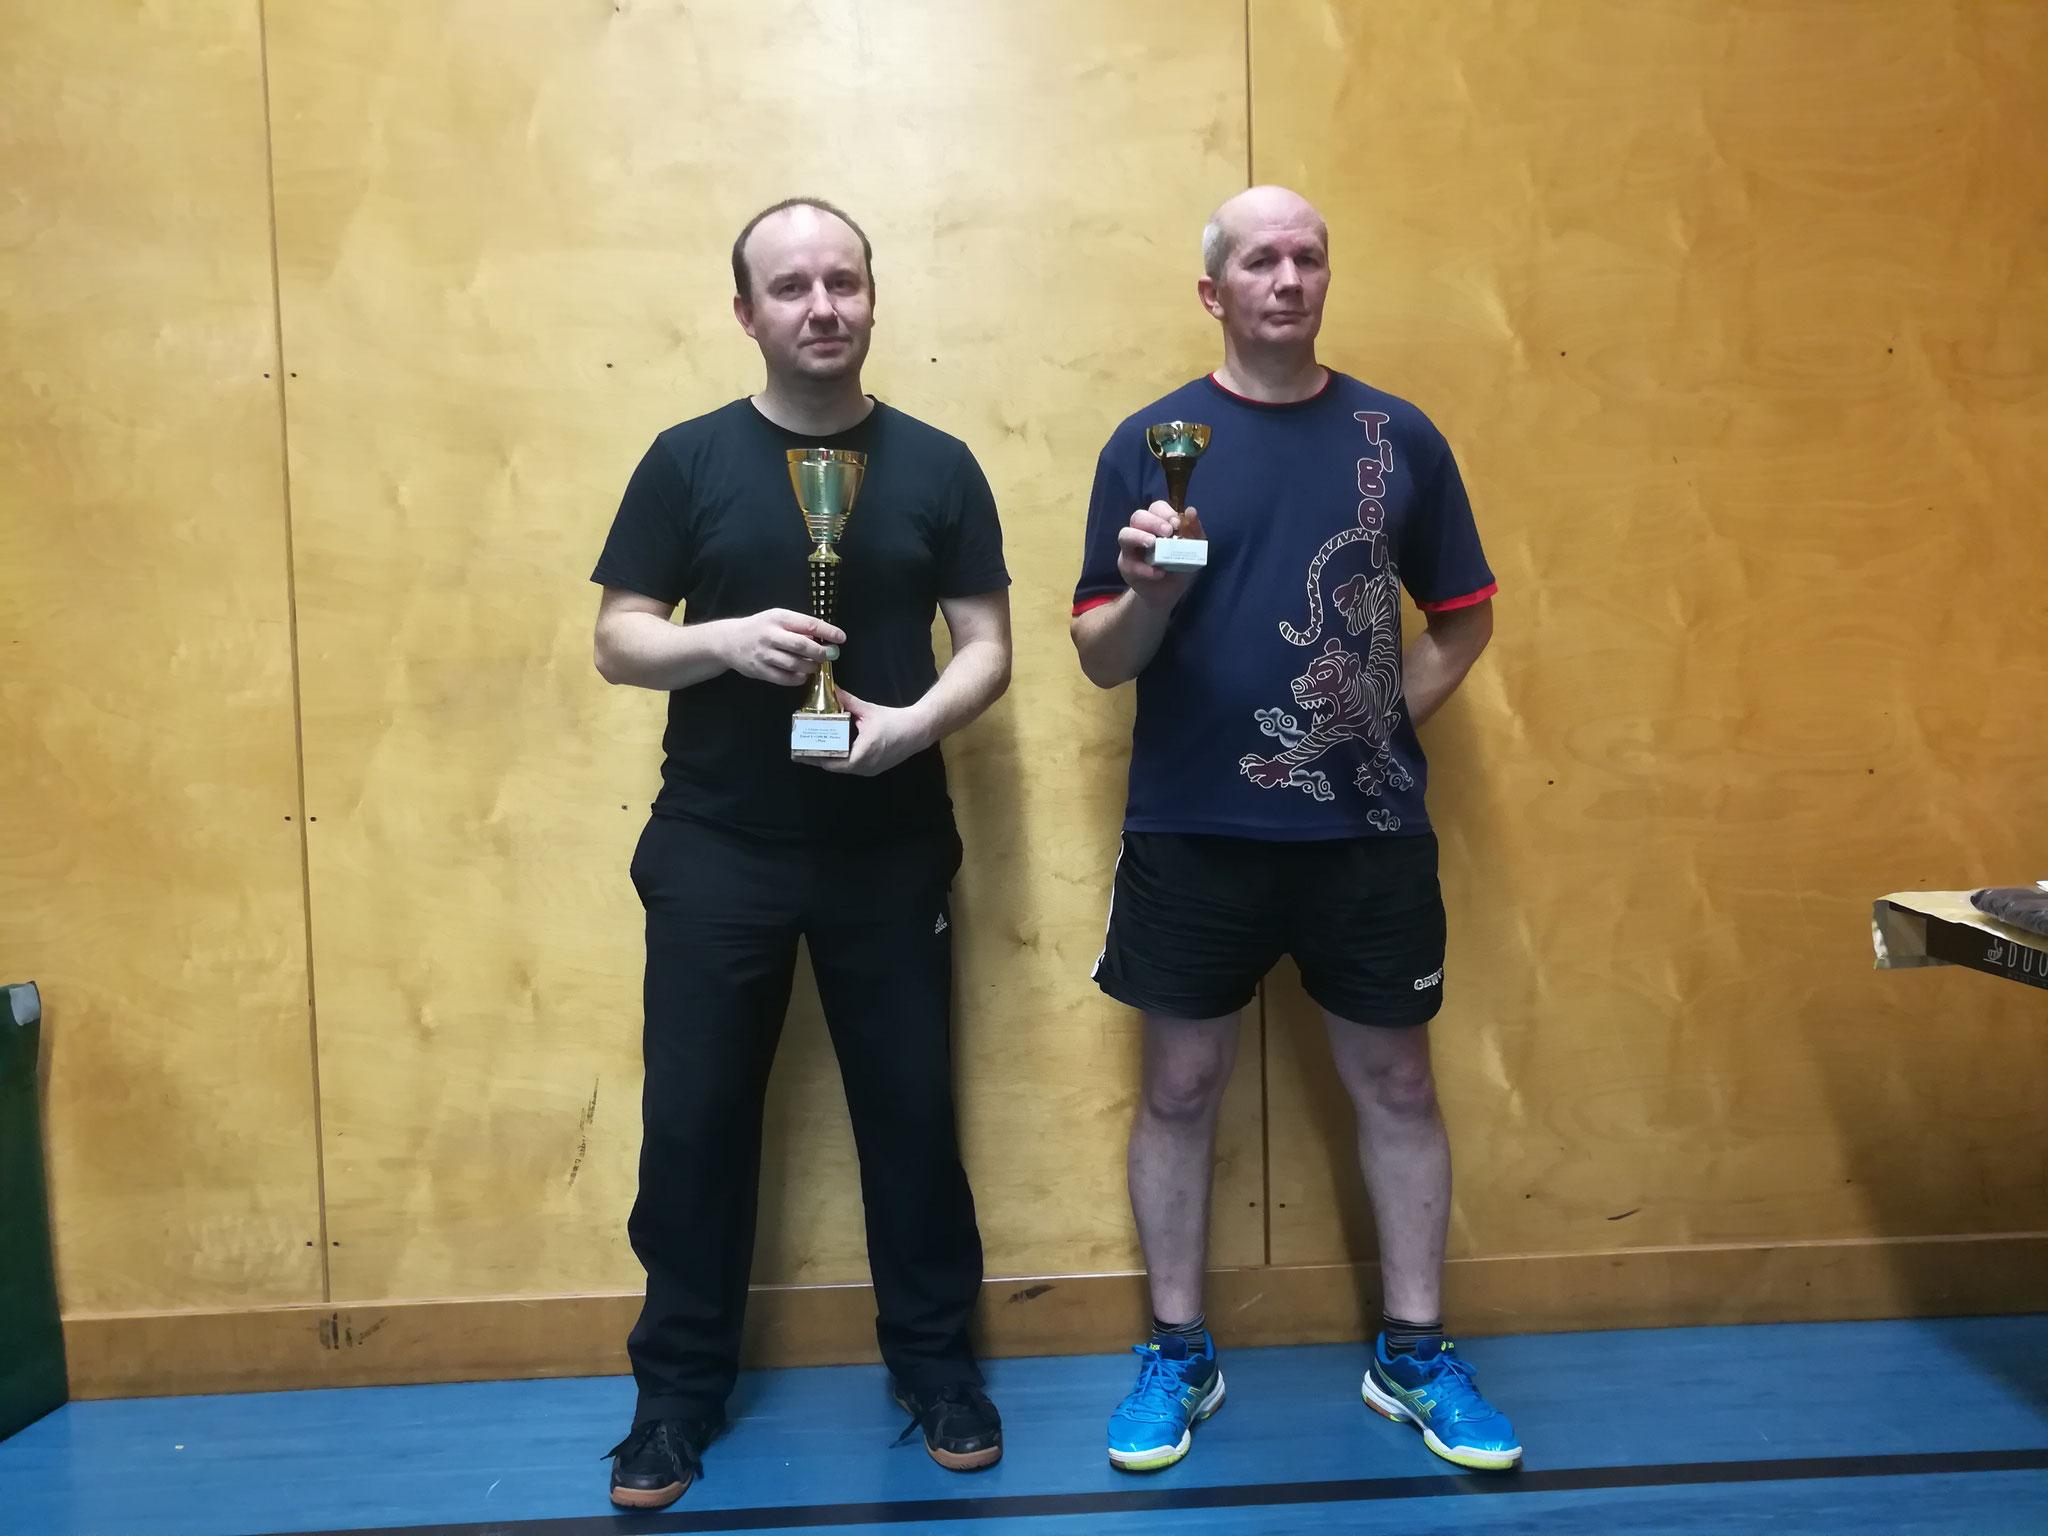 Siegerfoto Bewerb Y: v.l.n.r. Pawel Piotr Galek (LENZ) (Sieger), Endre Pelsöczi (URAP) (Platz 3)